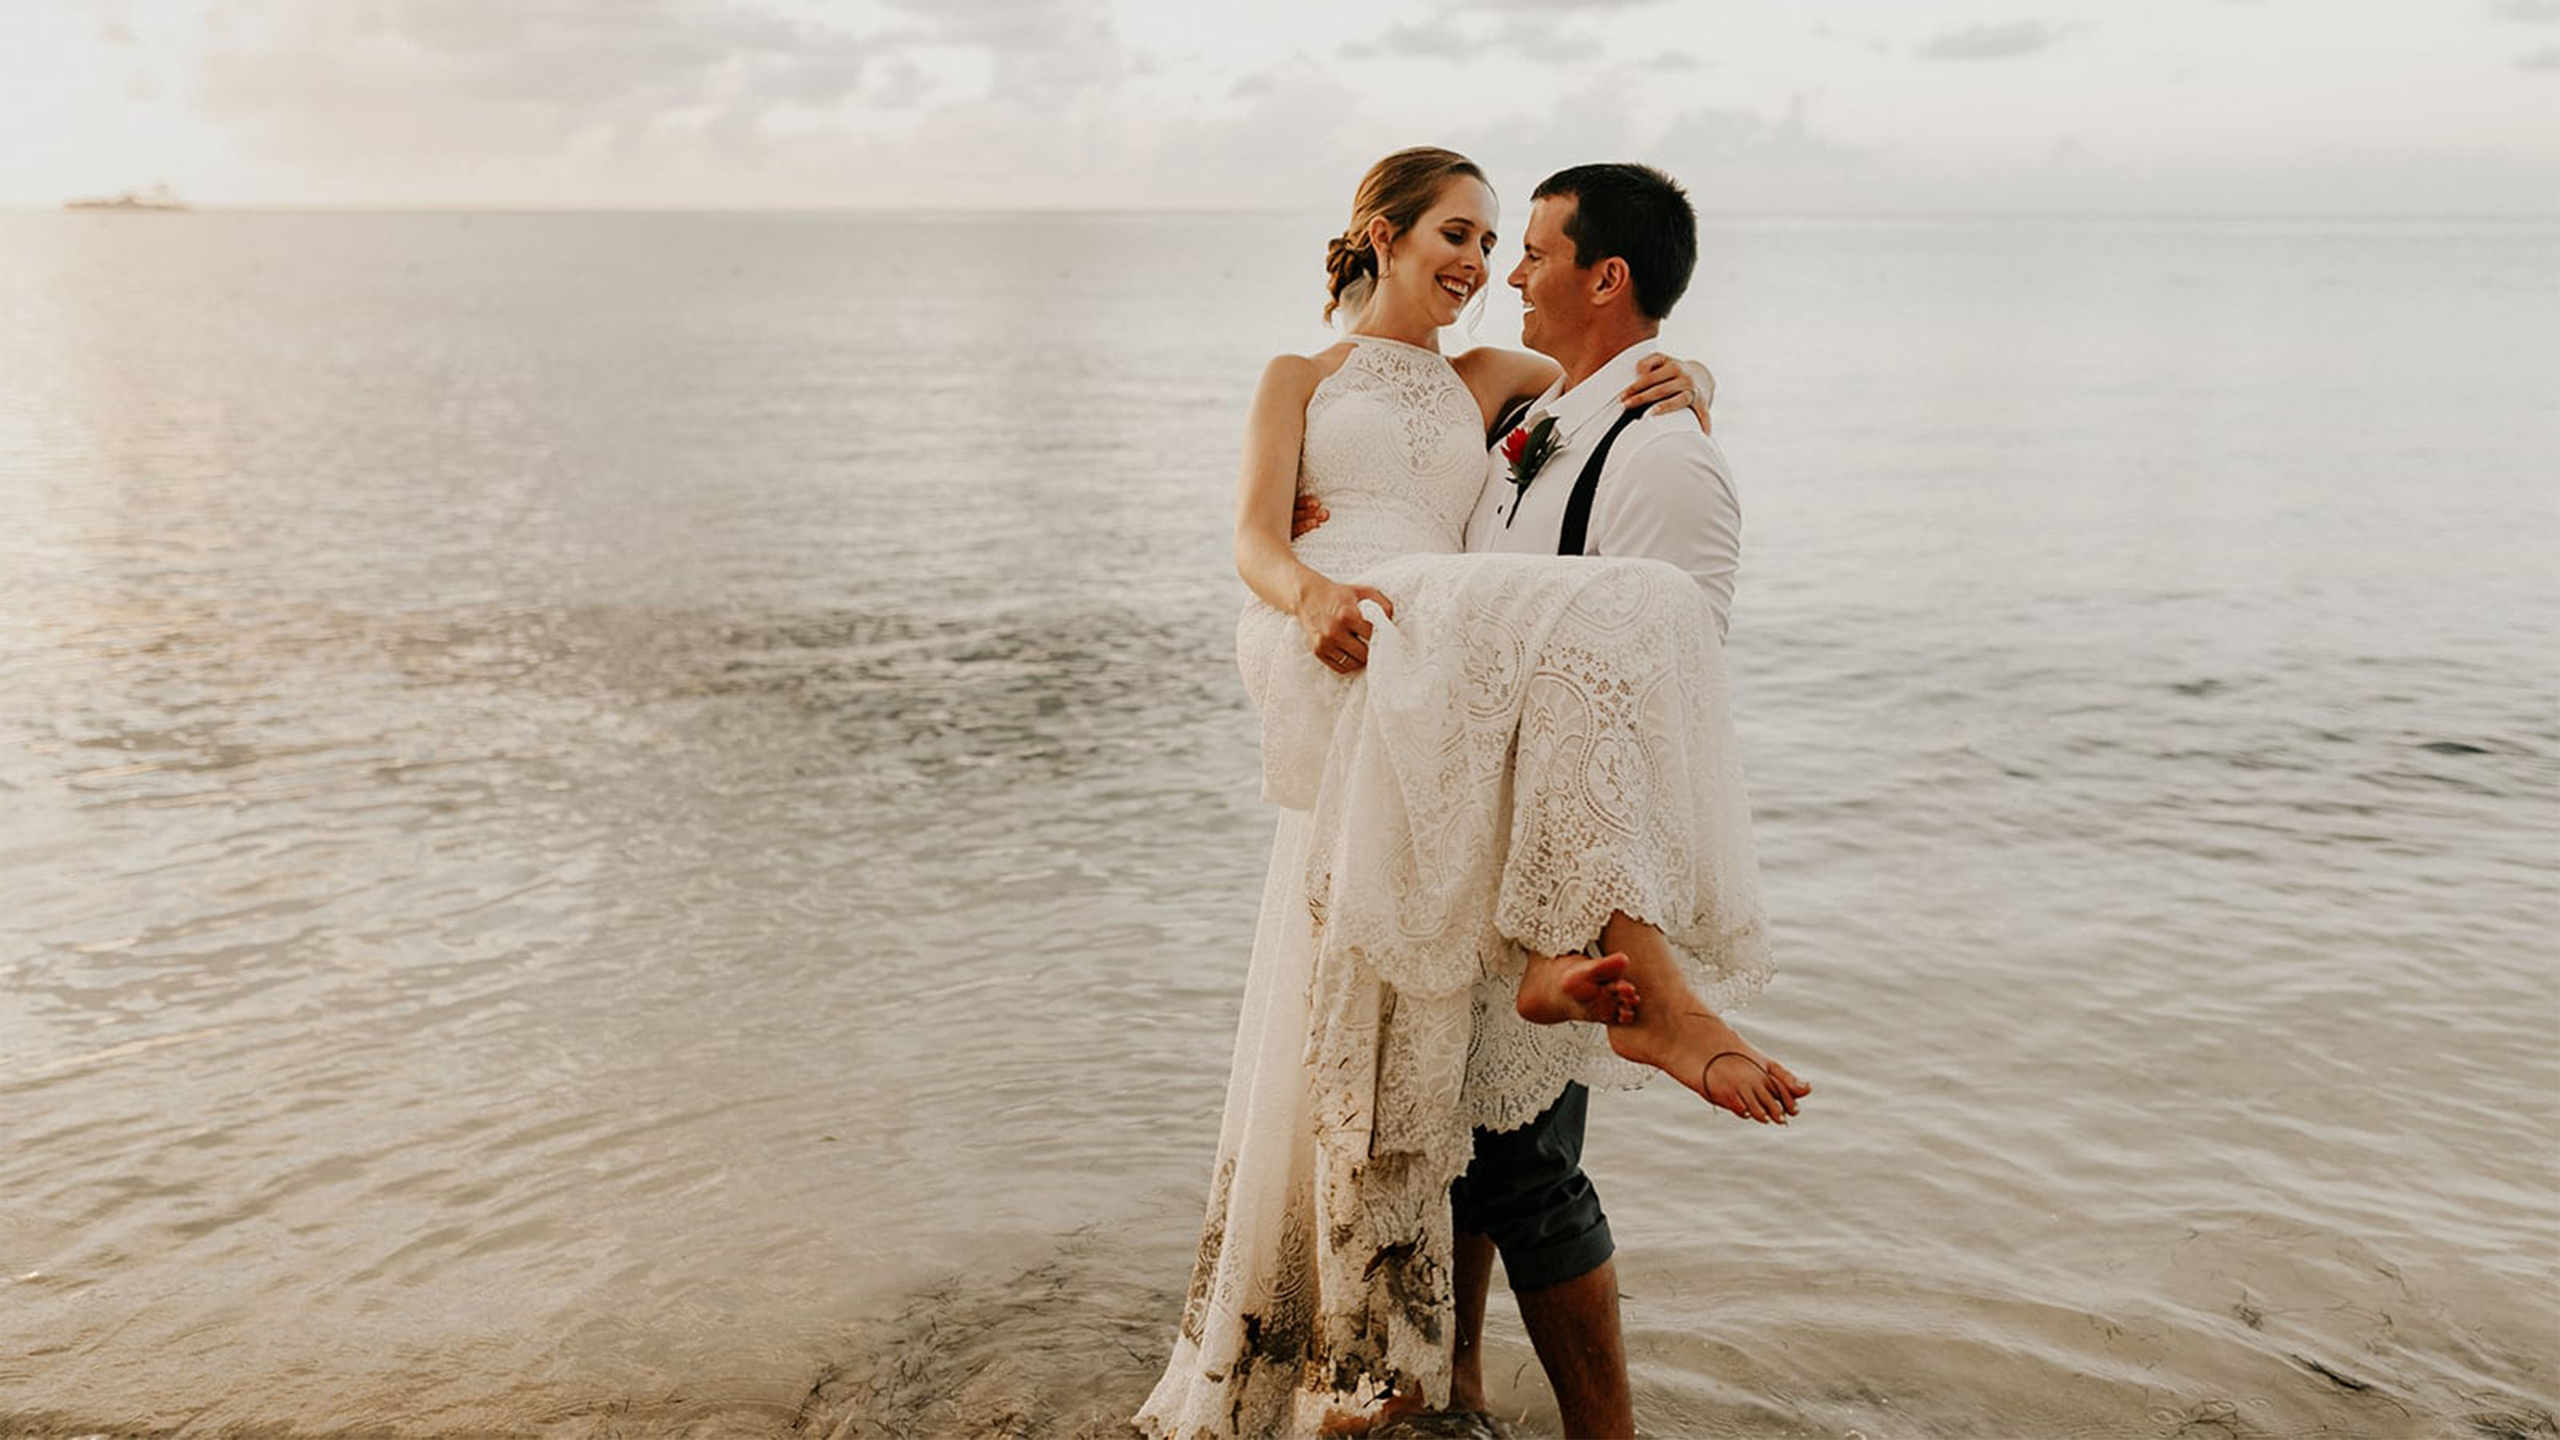 Bobby + Kaylie | Negril, Jamaica | Riu Palace Tropical Bay